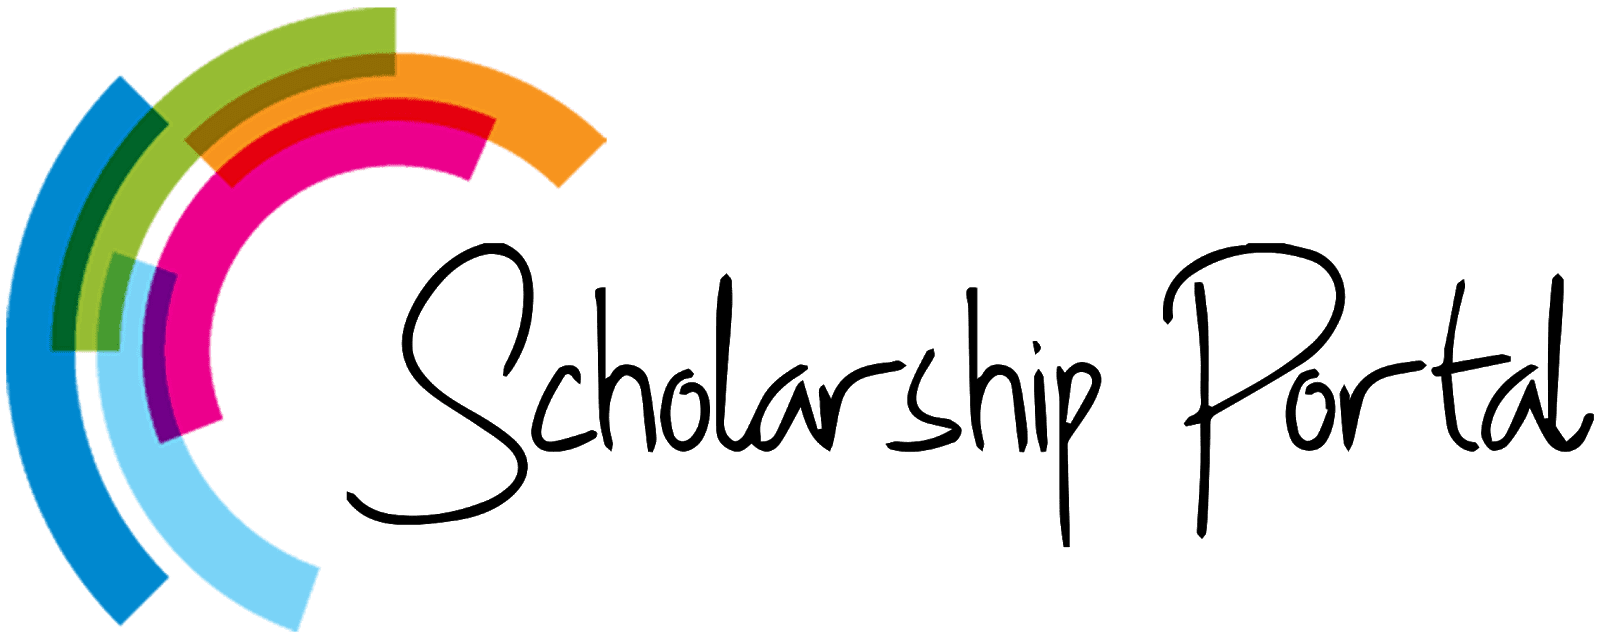 Transform Together Scholarships 2018